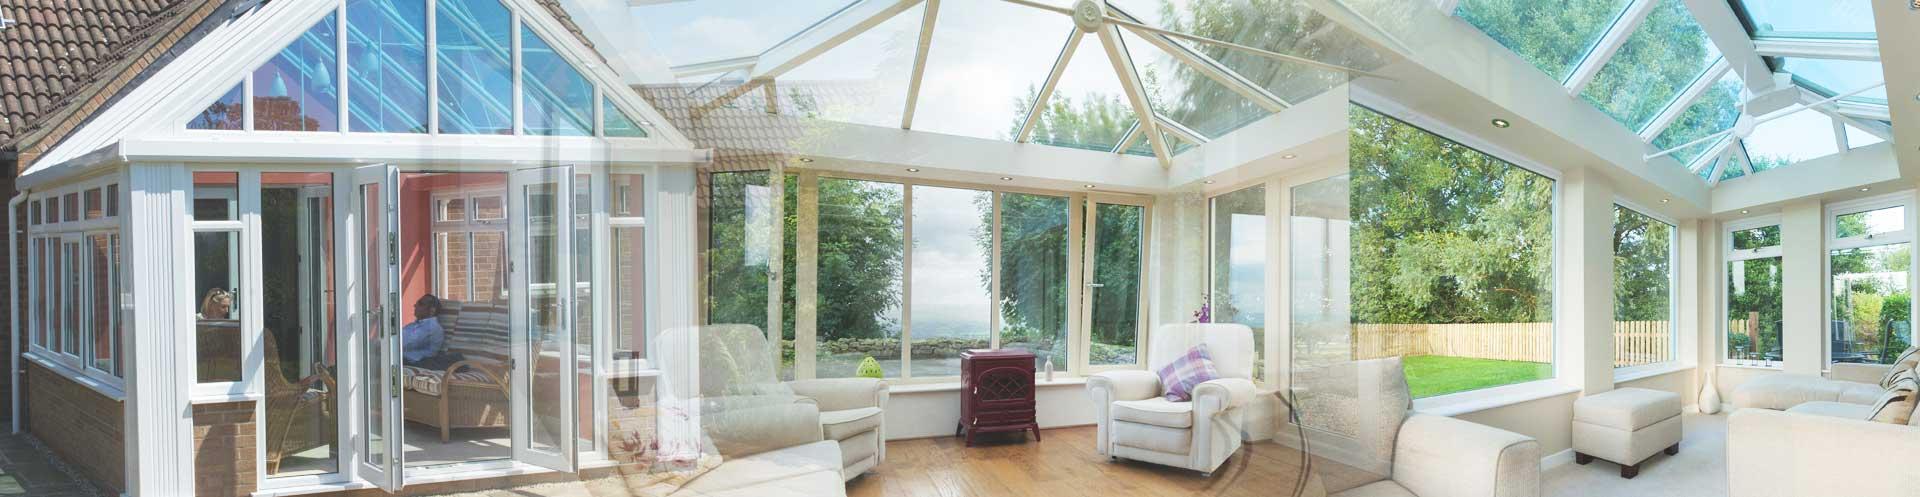 Conservatory roof split image